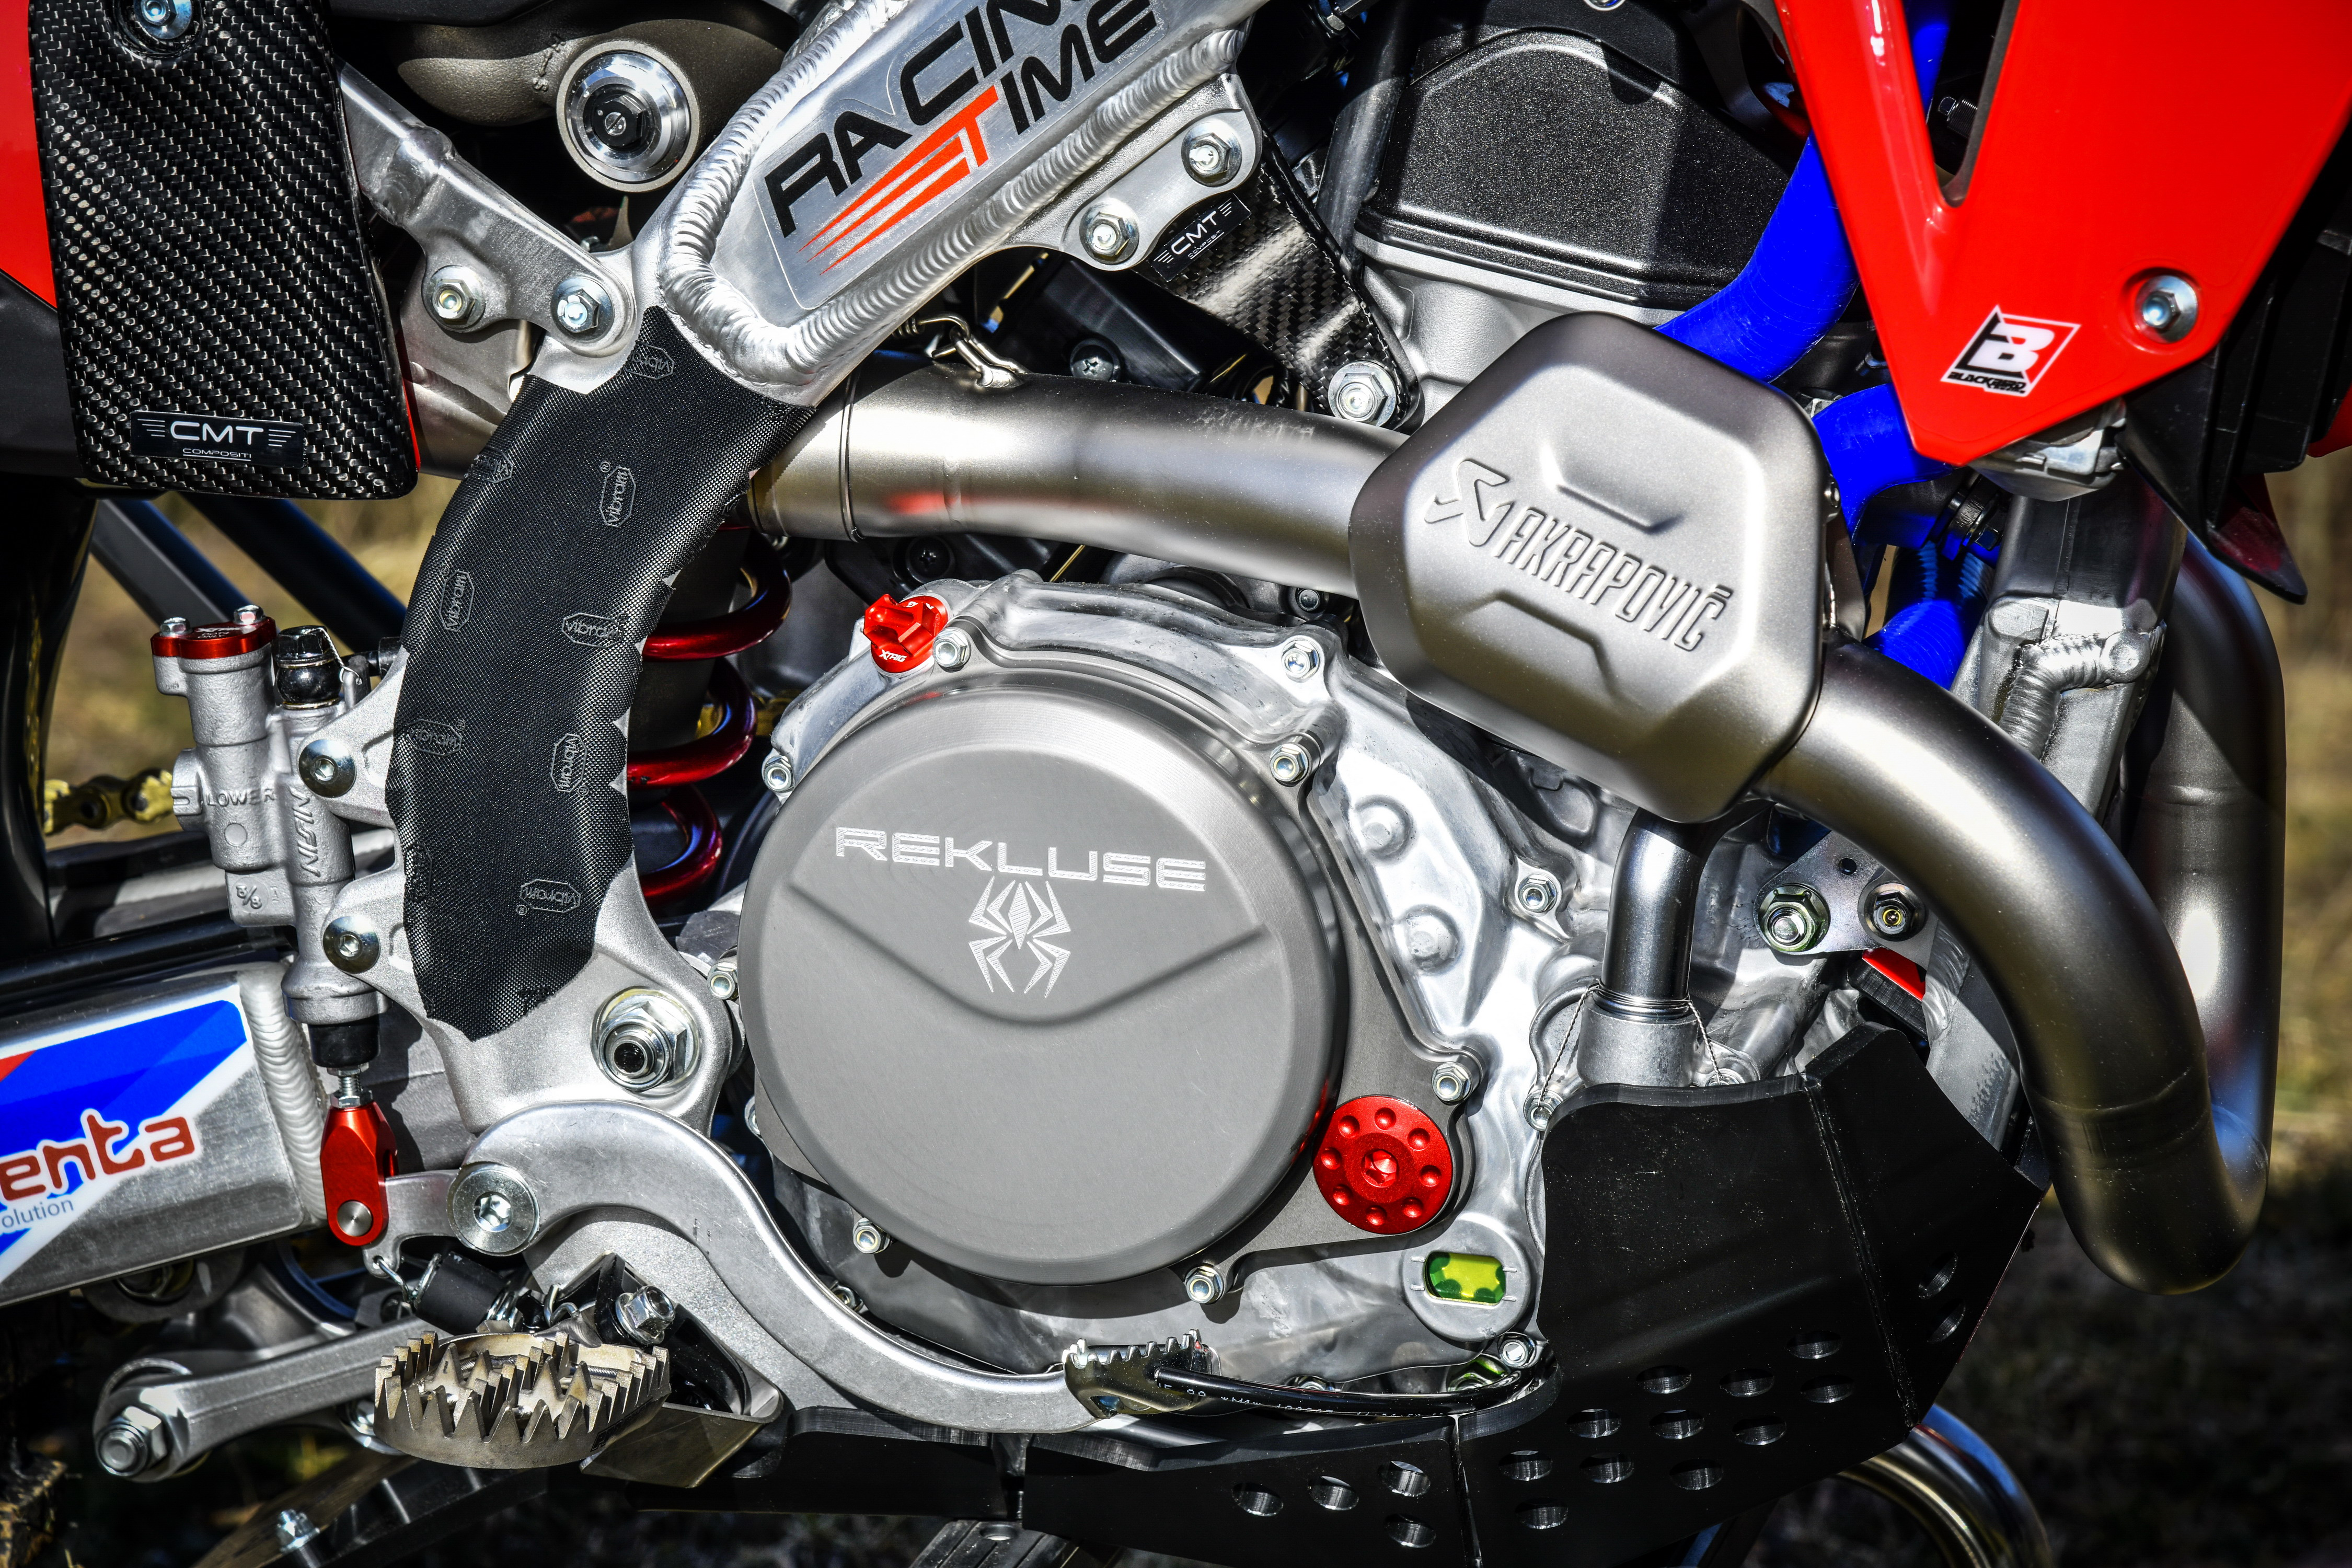 本田 HondaCRF250R��特��:Honda 2021 EnduroGP工�S��